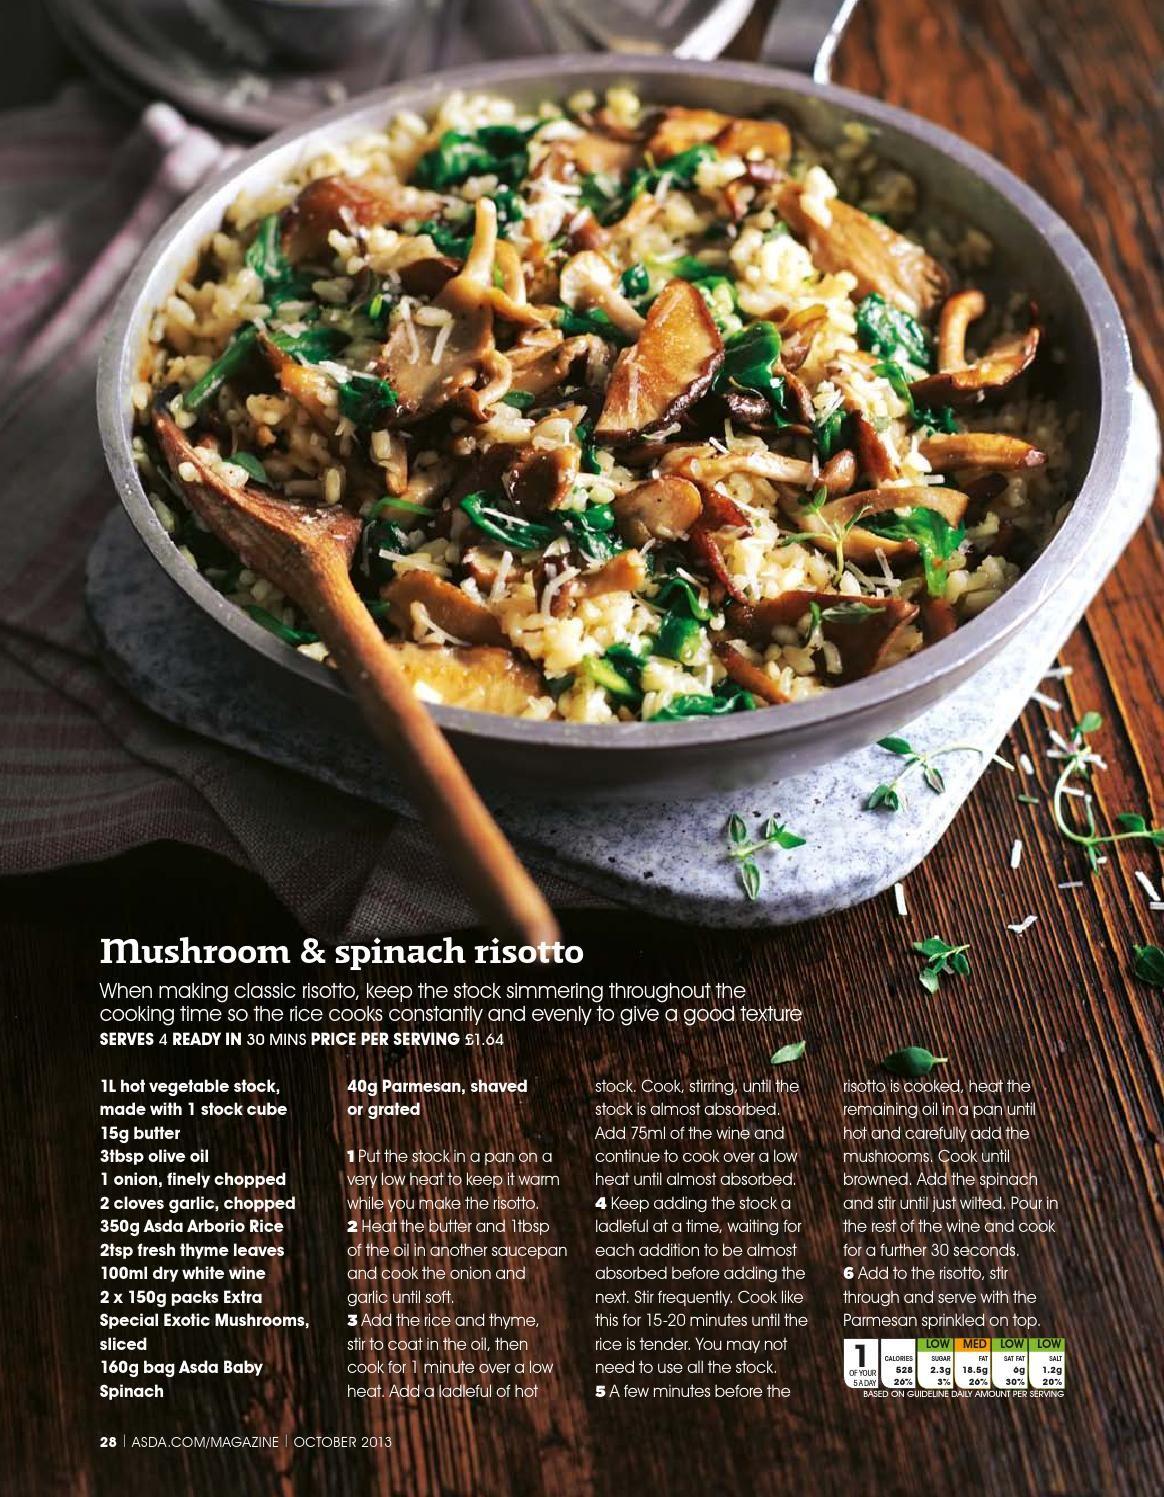 Asda Magazine October 2013 Spinach Risotto Asda Recipes Stuffed Mushrooms